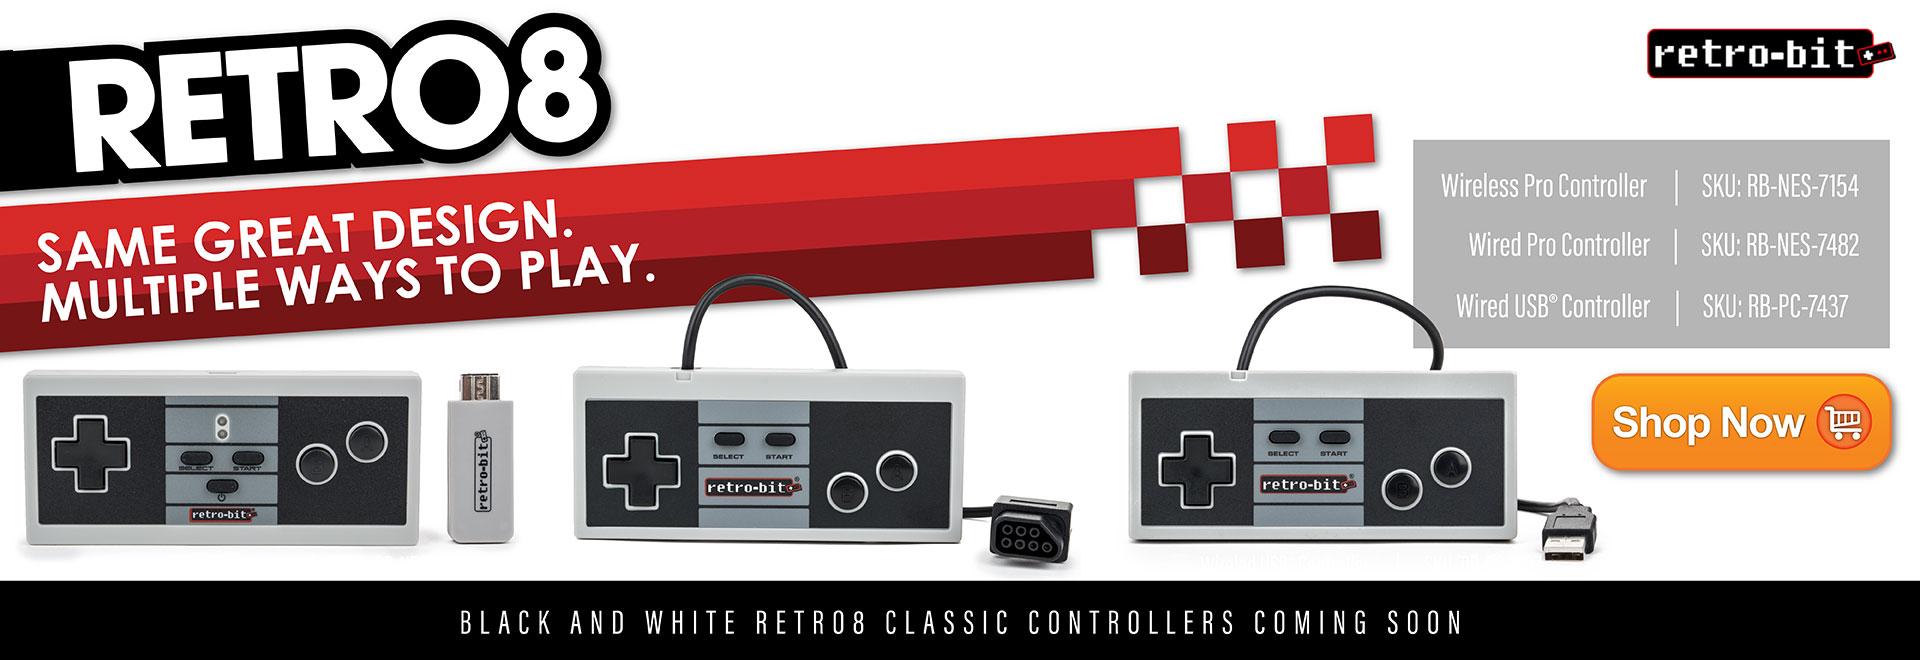 Retro8 Controllers